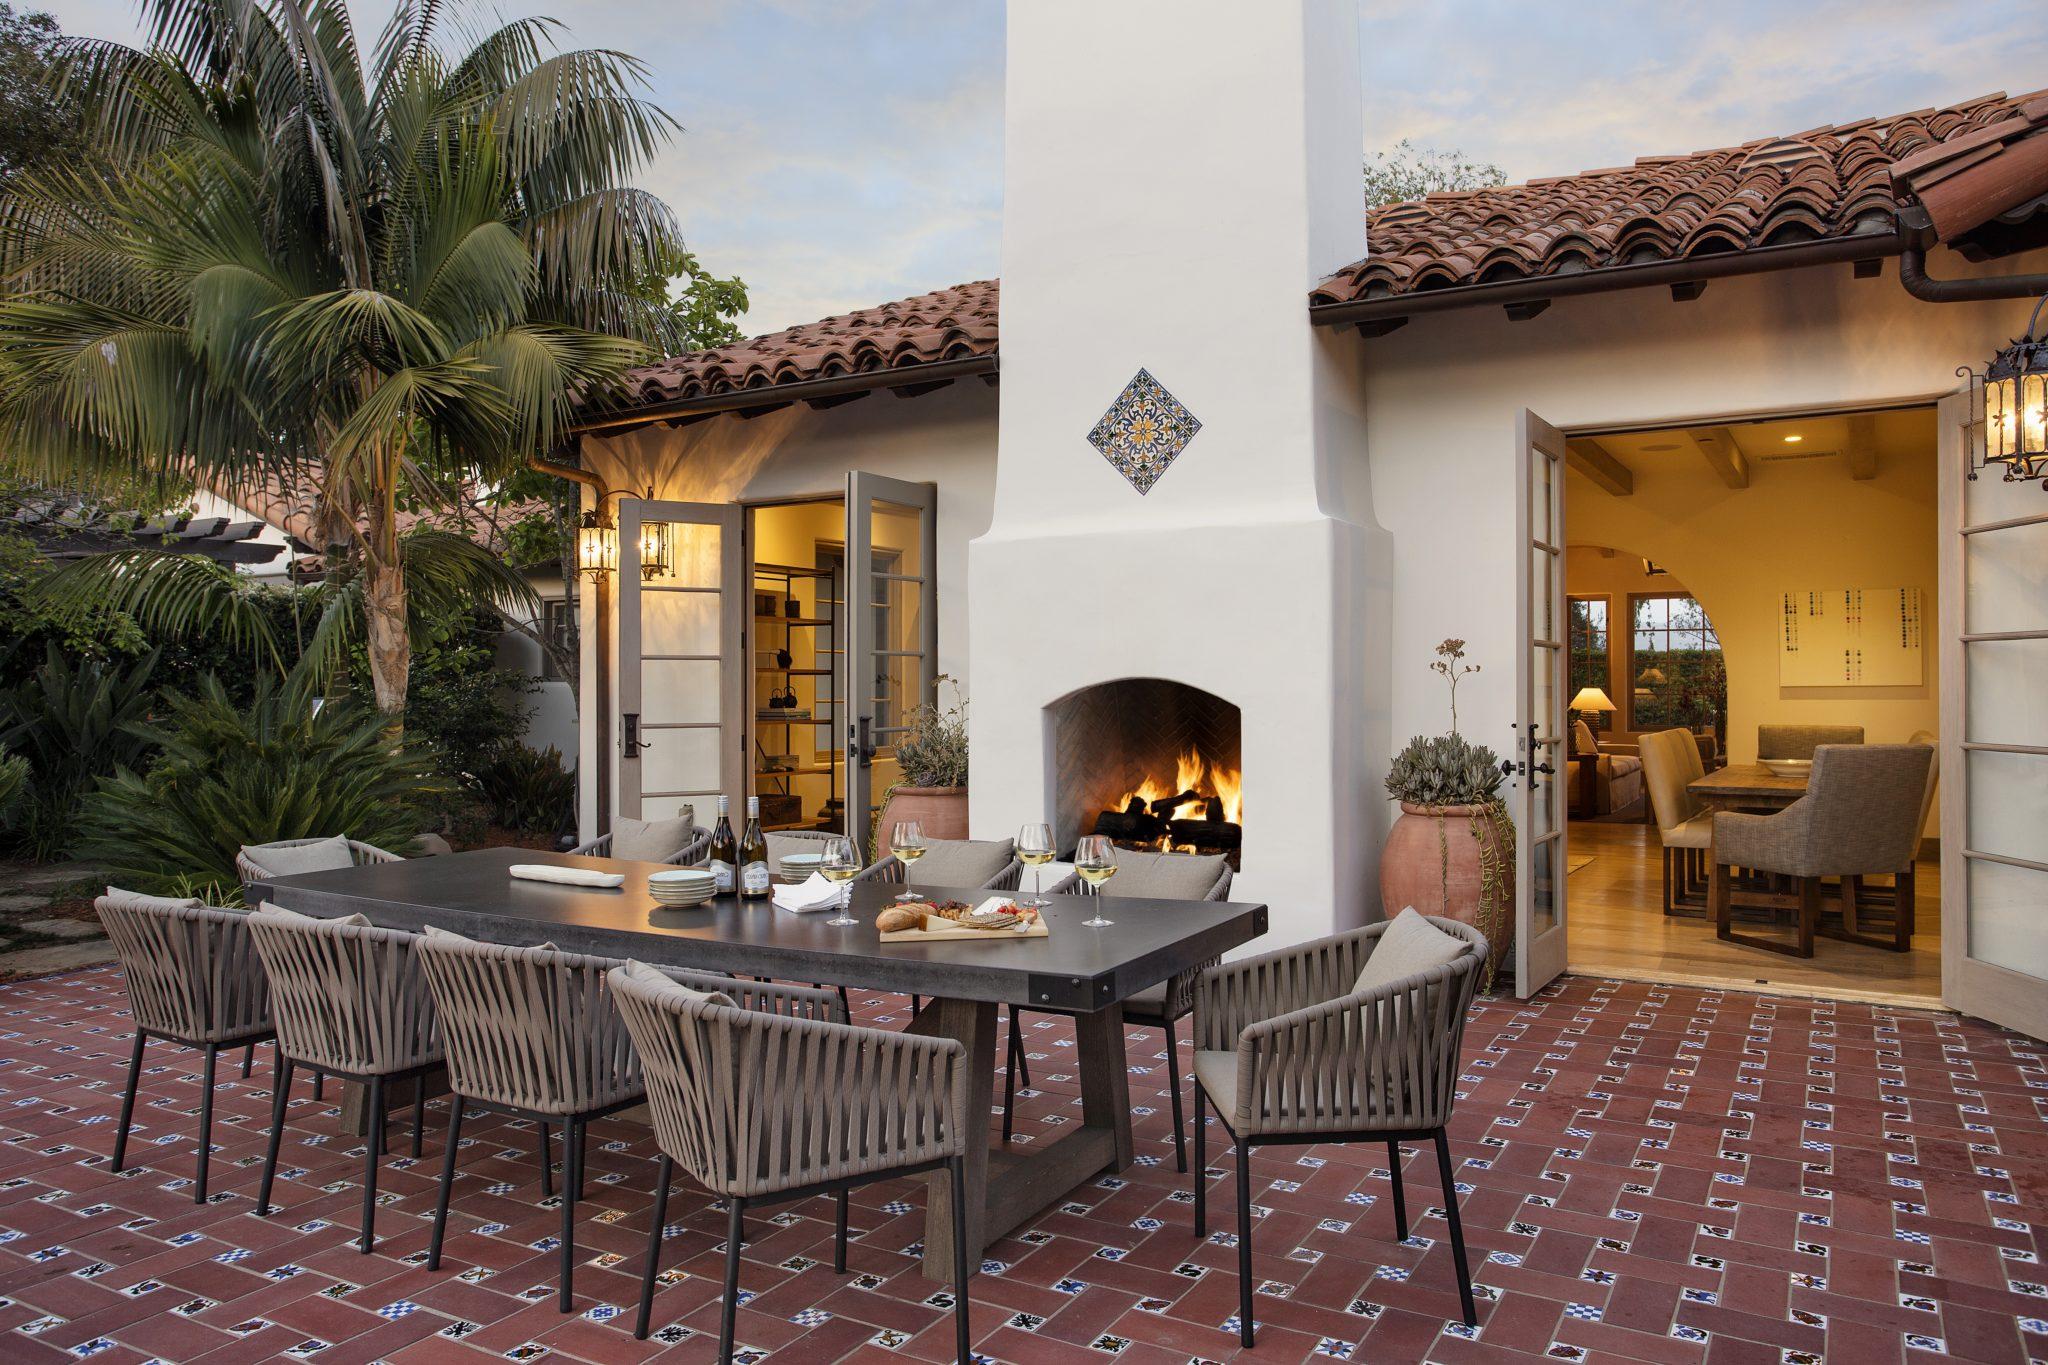 Montecito outdoor living space by Della + Zella Interiors